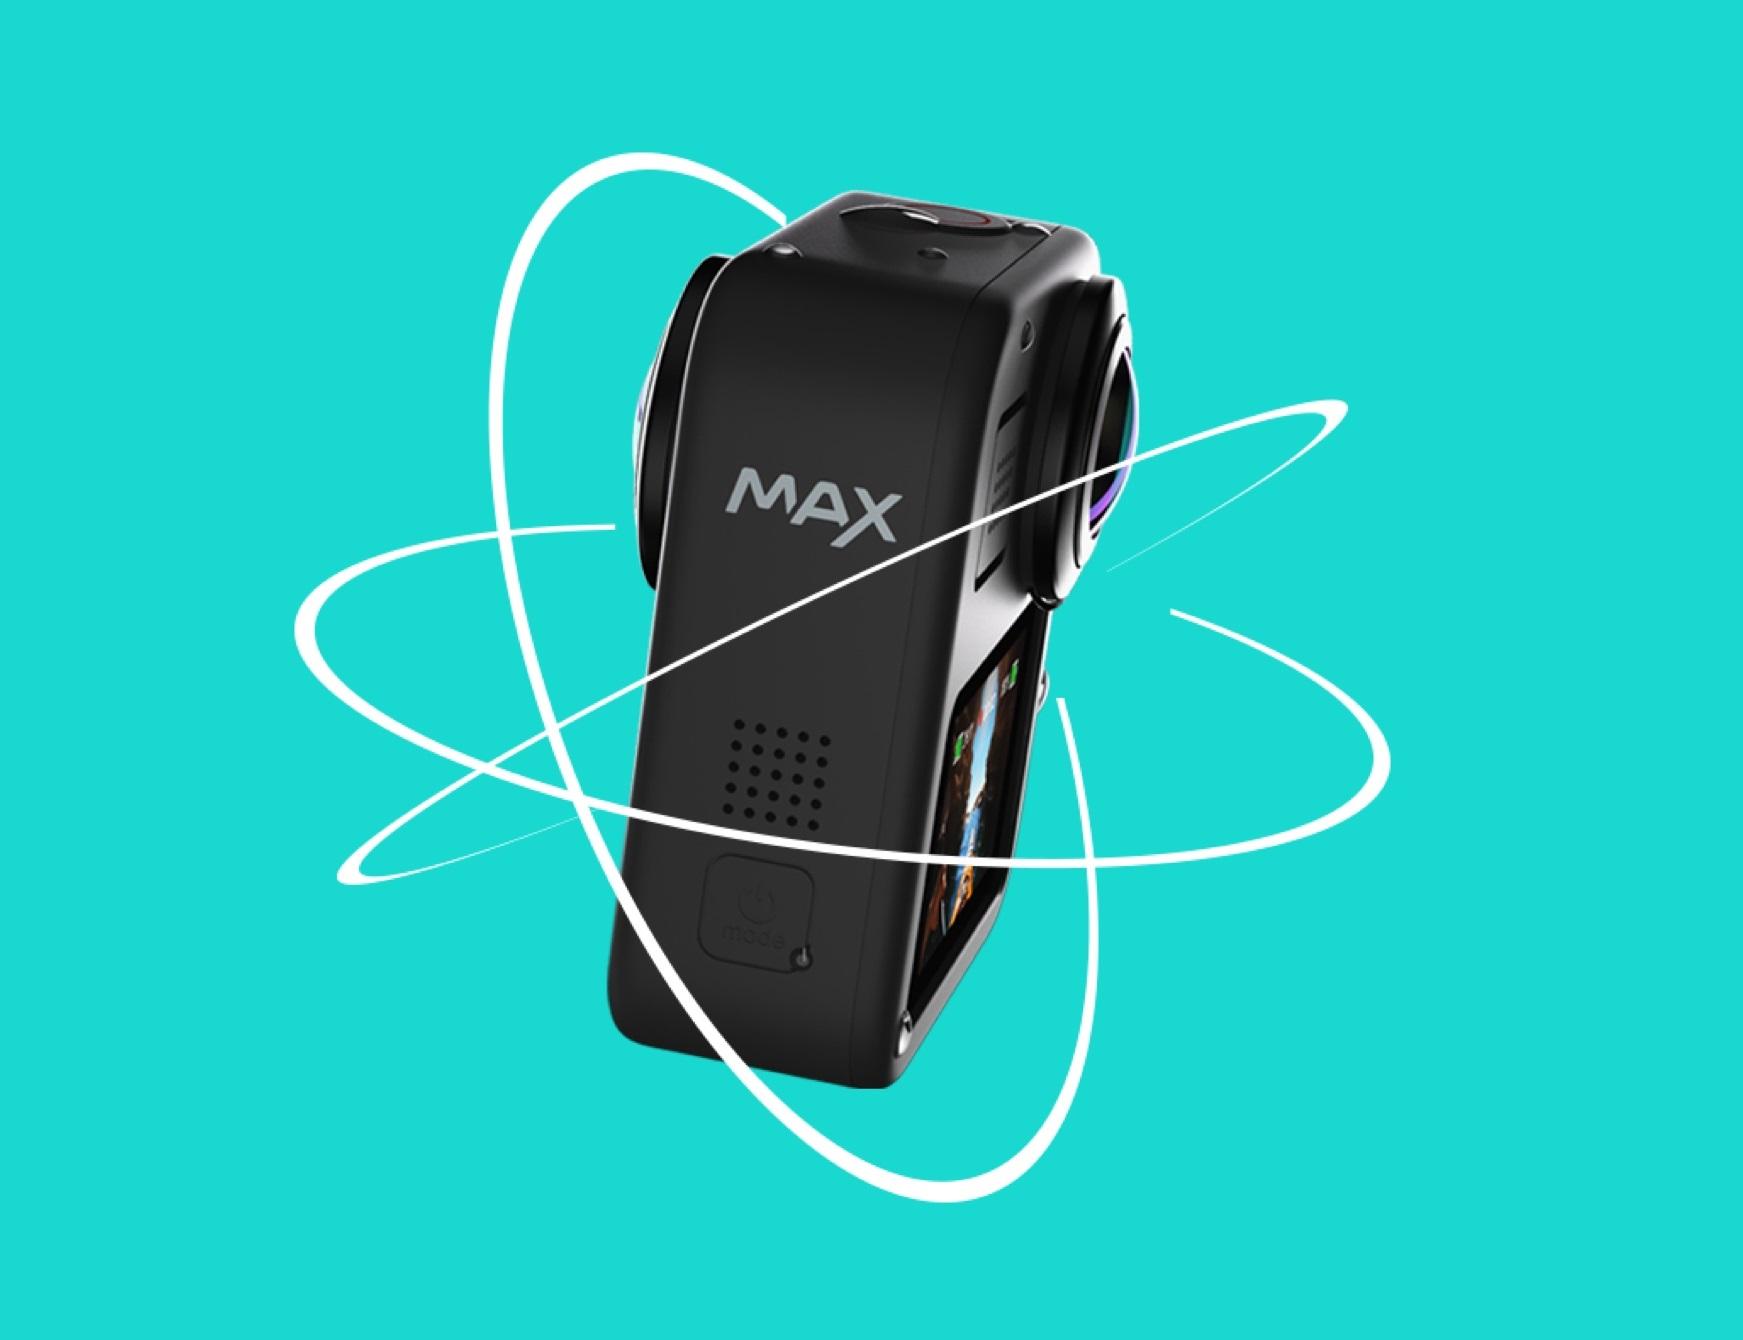 Экшн-камера GOPRO MAX (CHDHZ-201-FW), фото 4